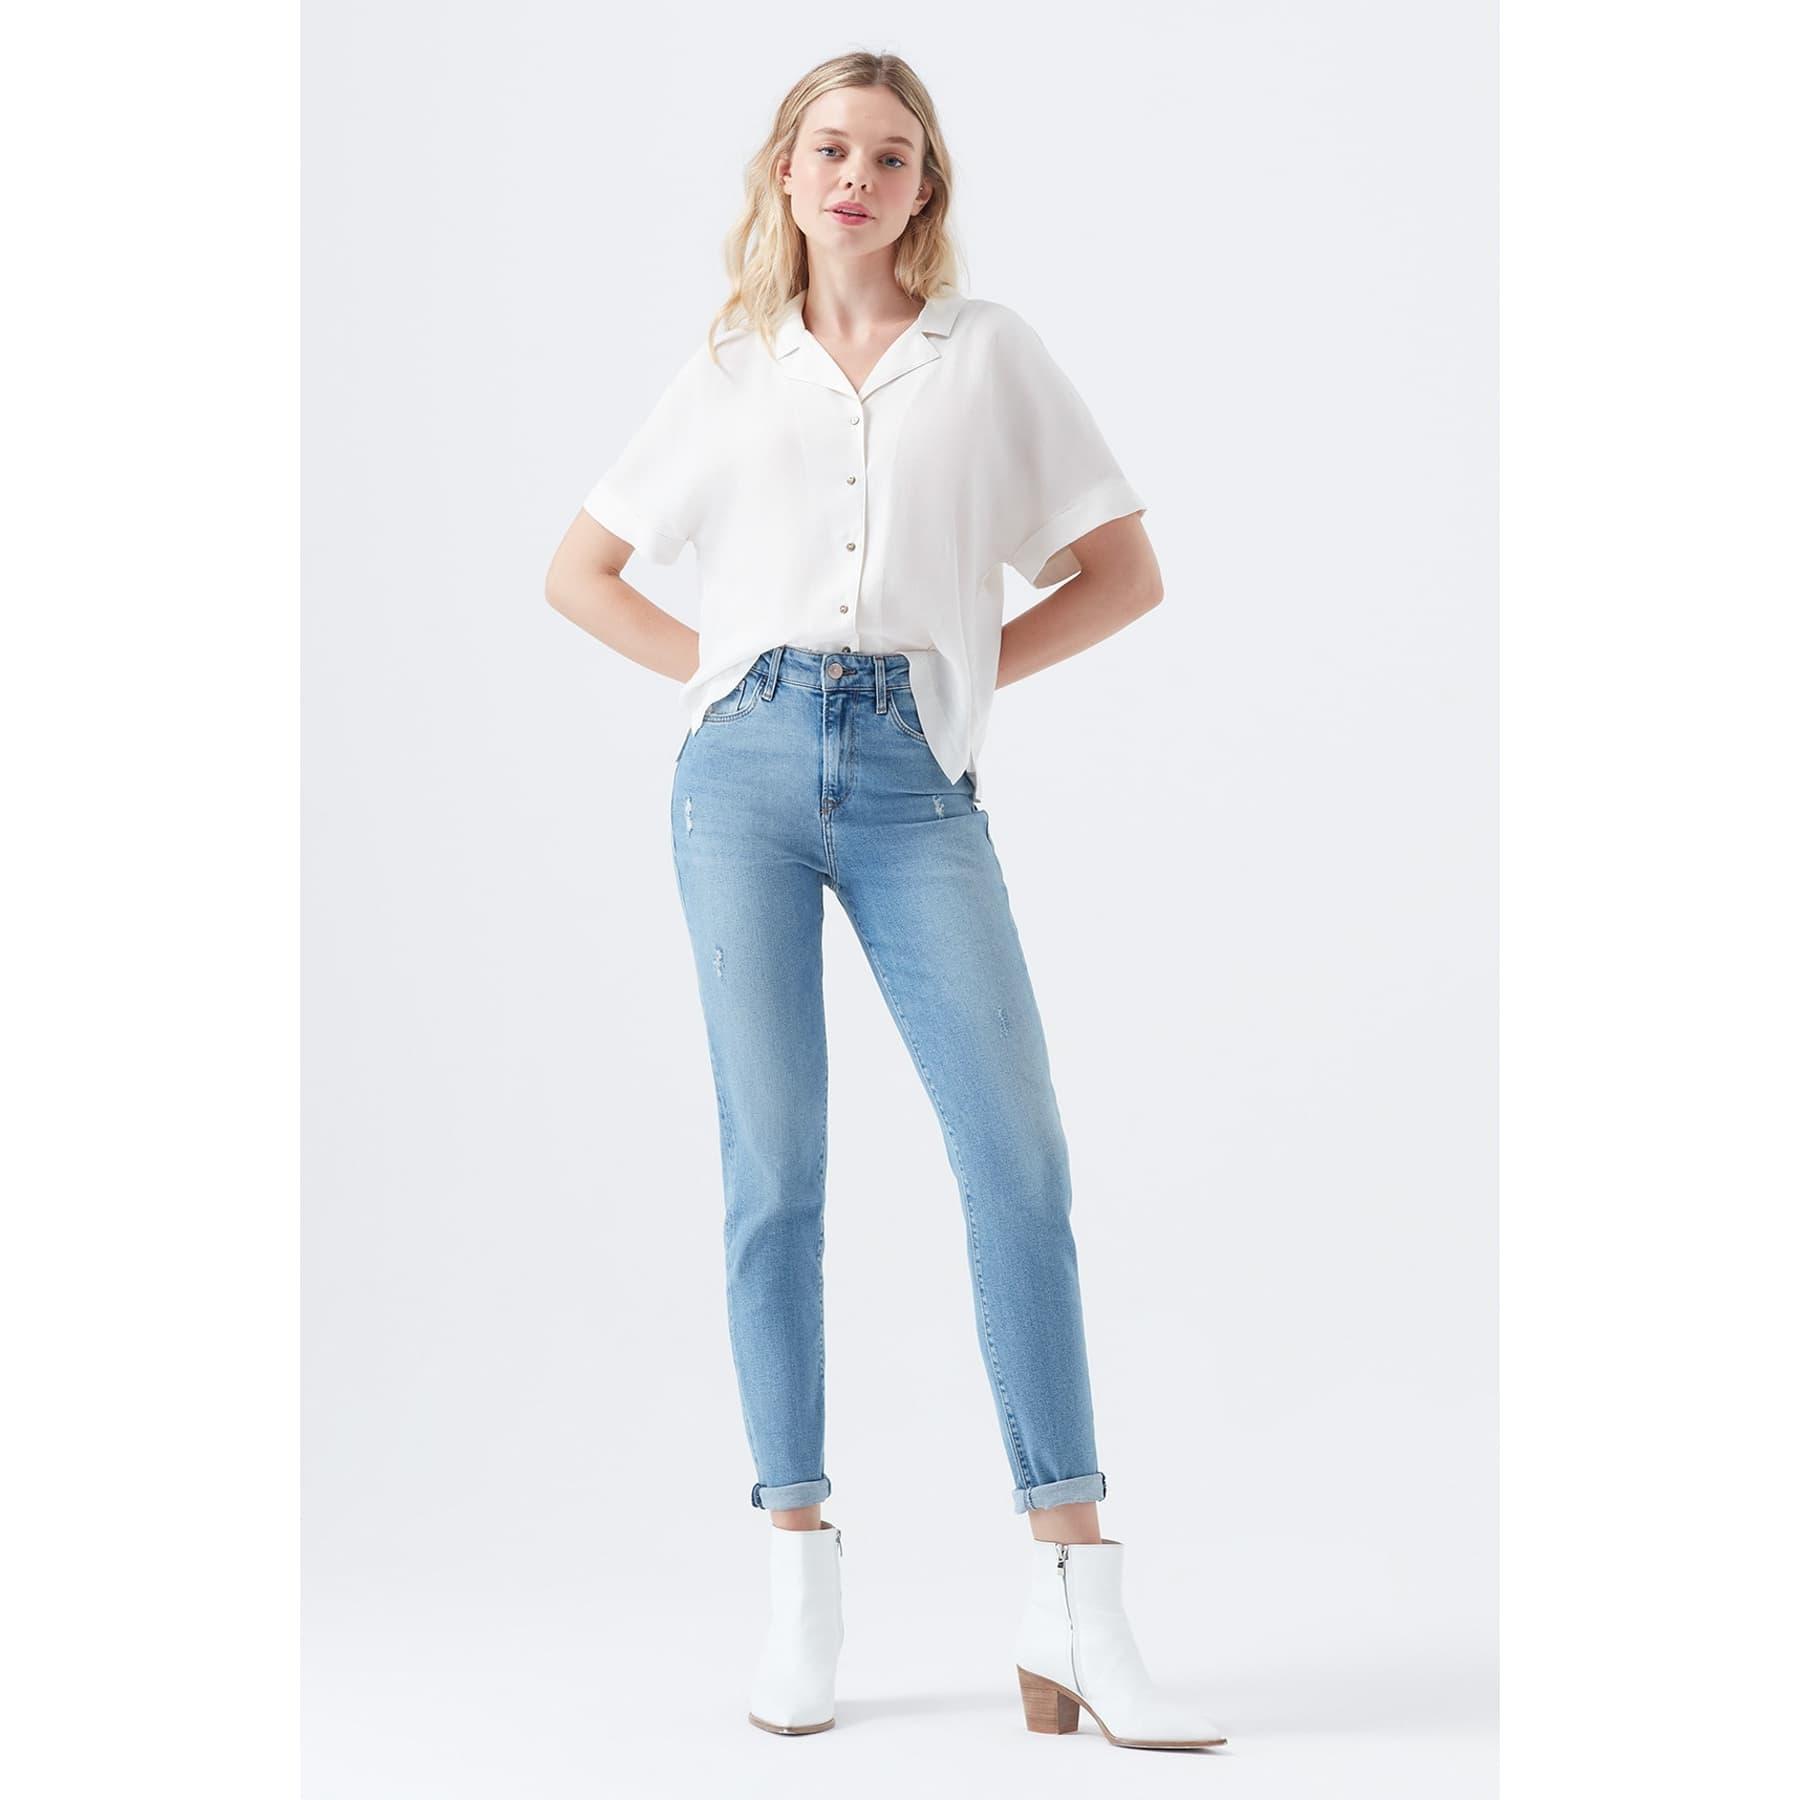 Cindy Vintage 90s Kadın Mavi Jean Pantolon